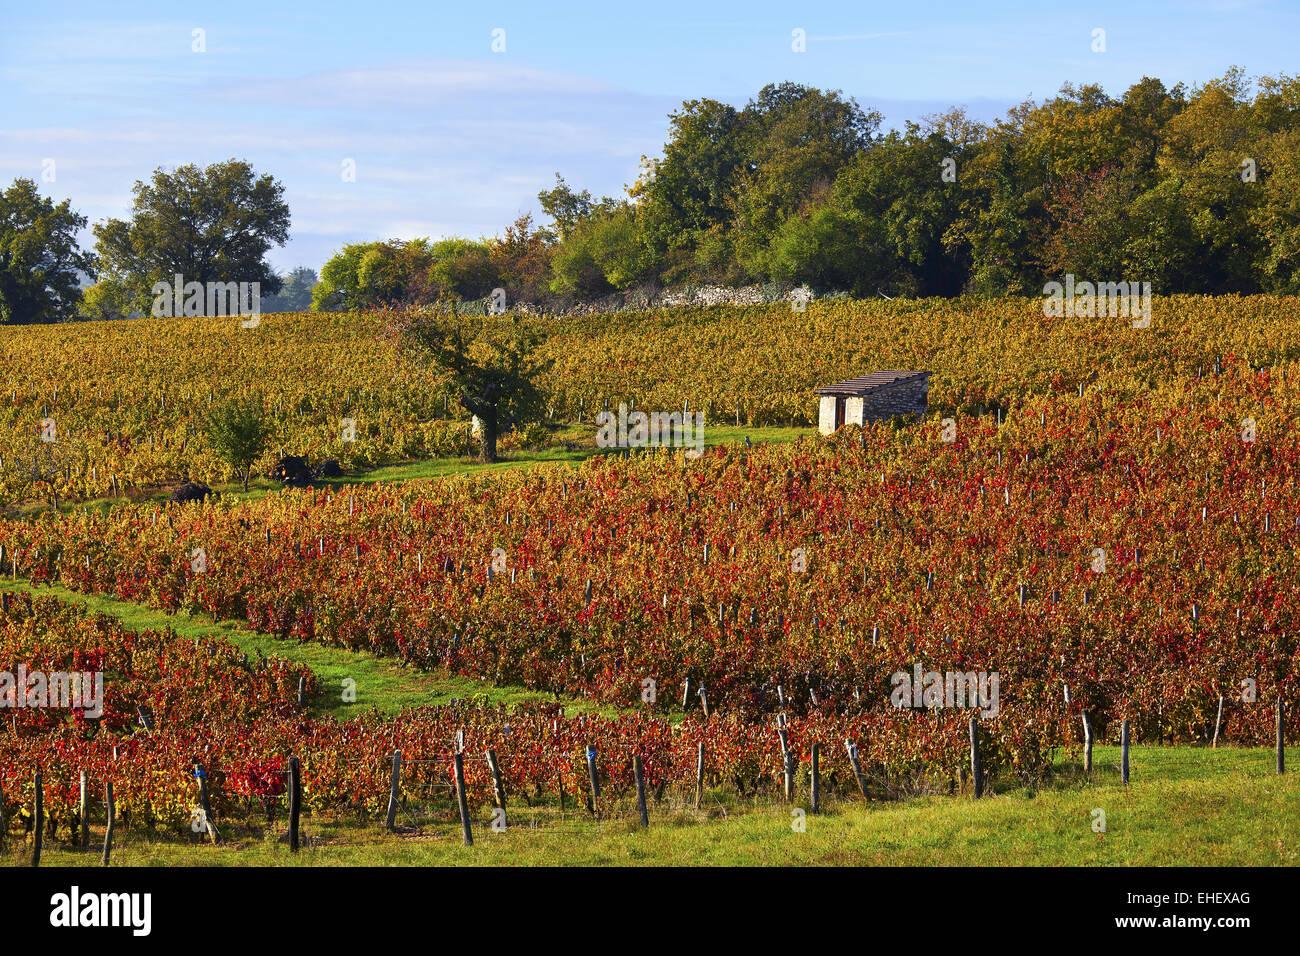 Beaujolais vineyards, Pommiers, Rhone, France - Stock Image